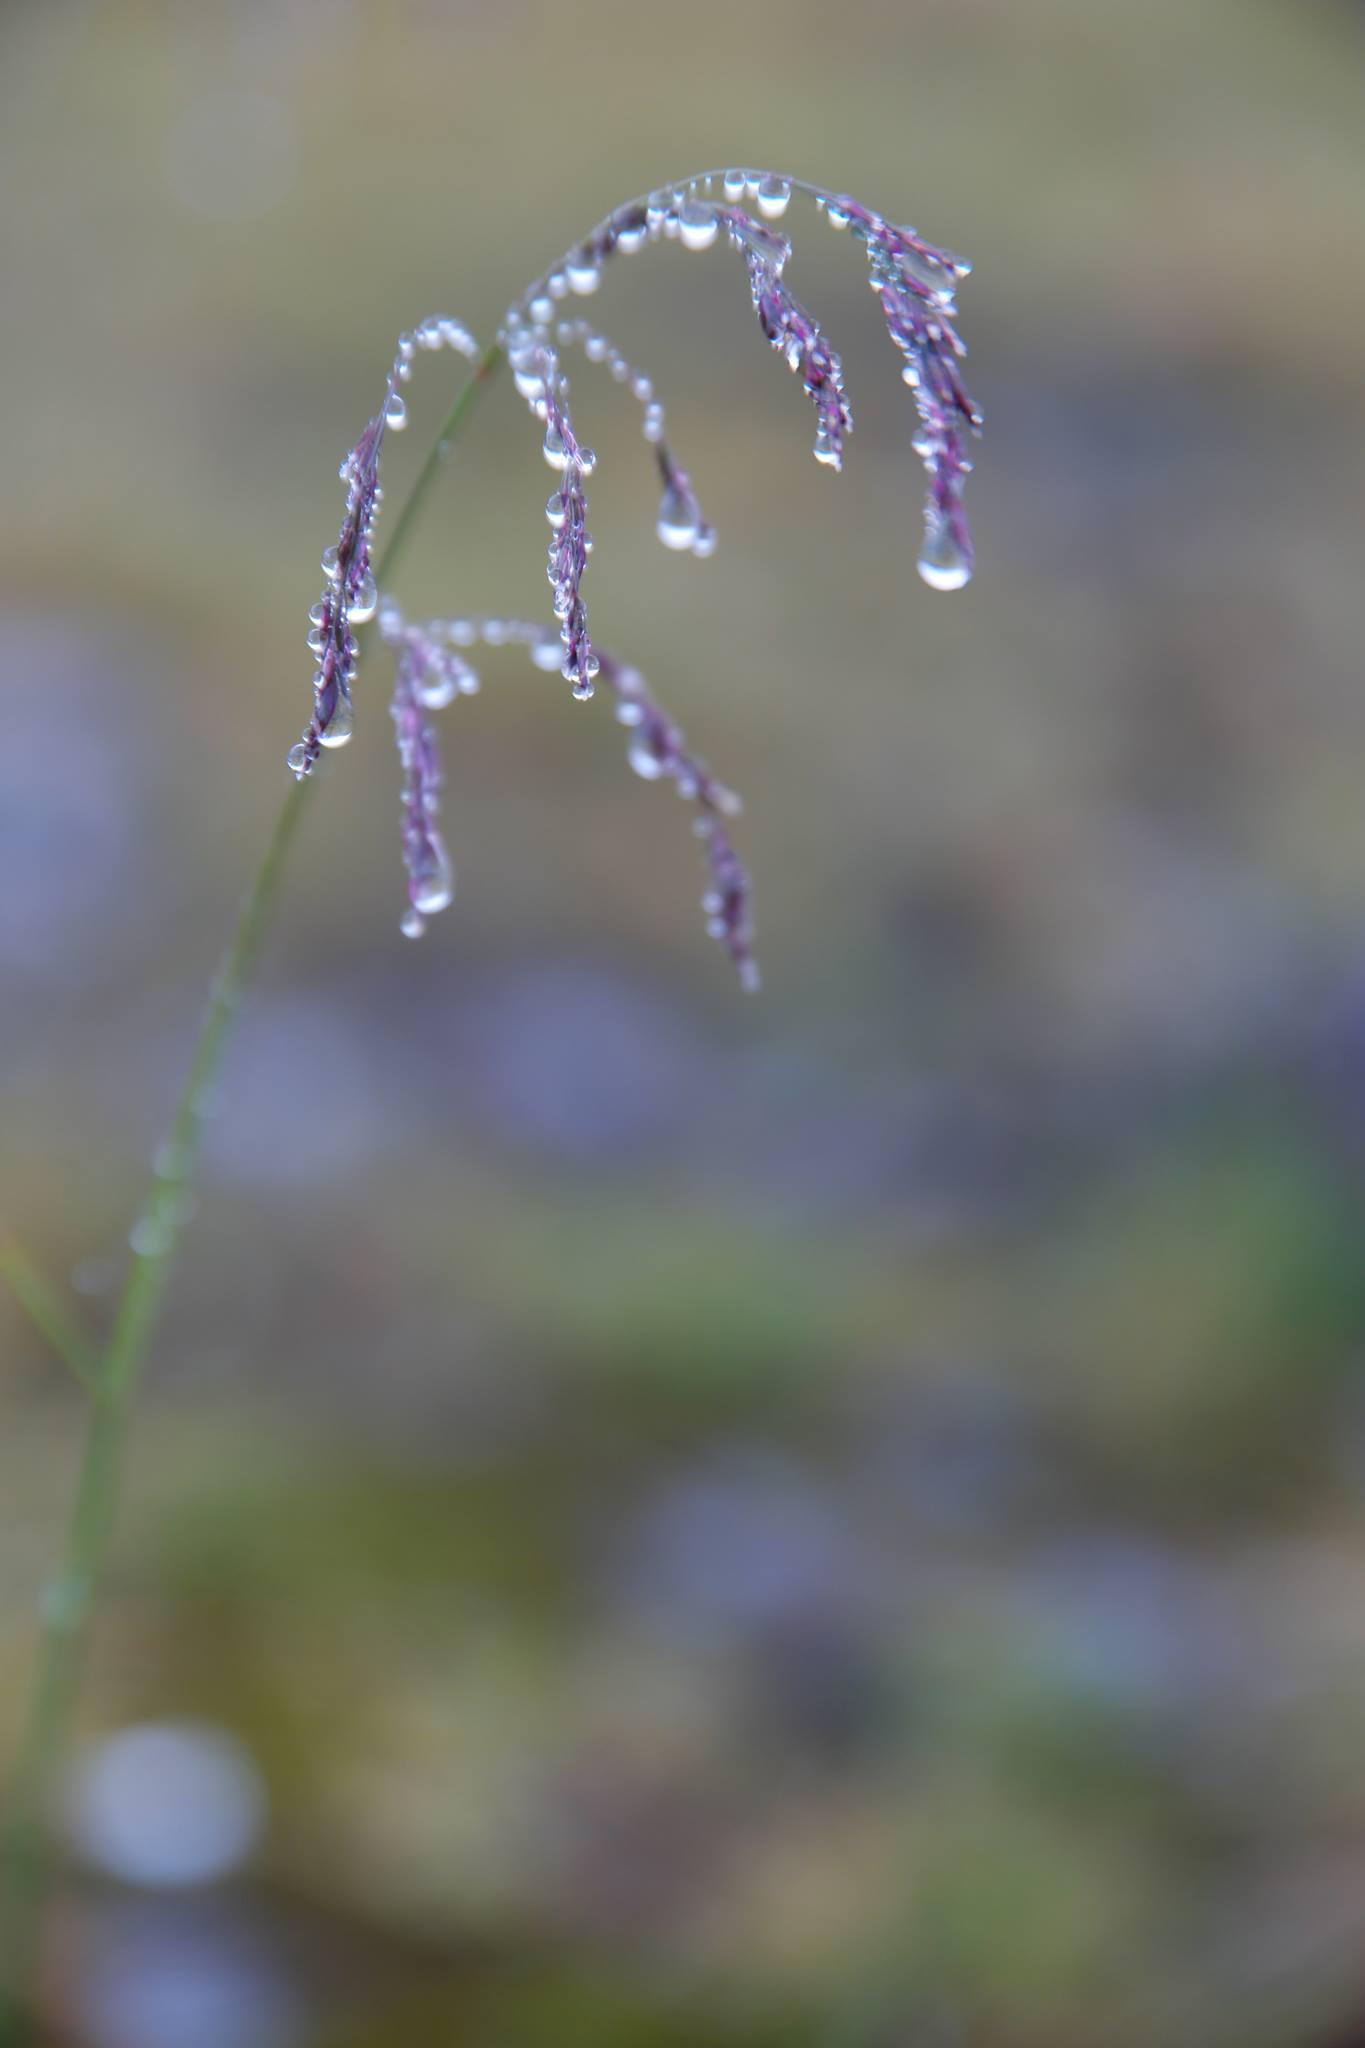 Kirsten Alana droplets